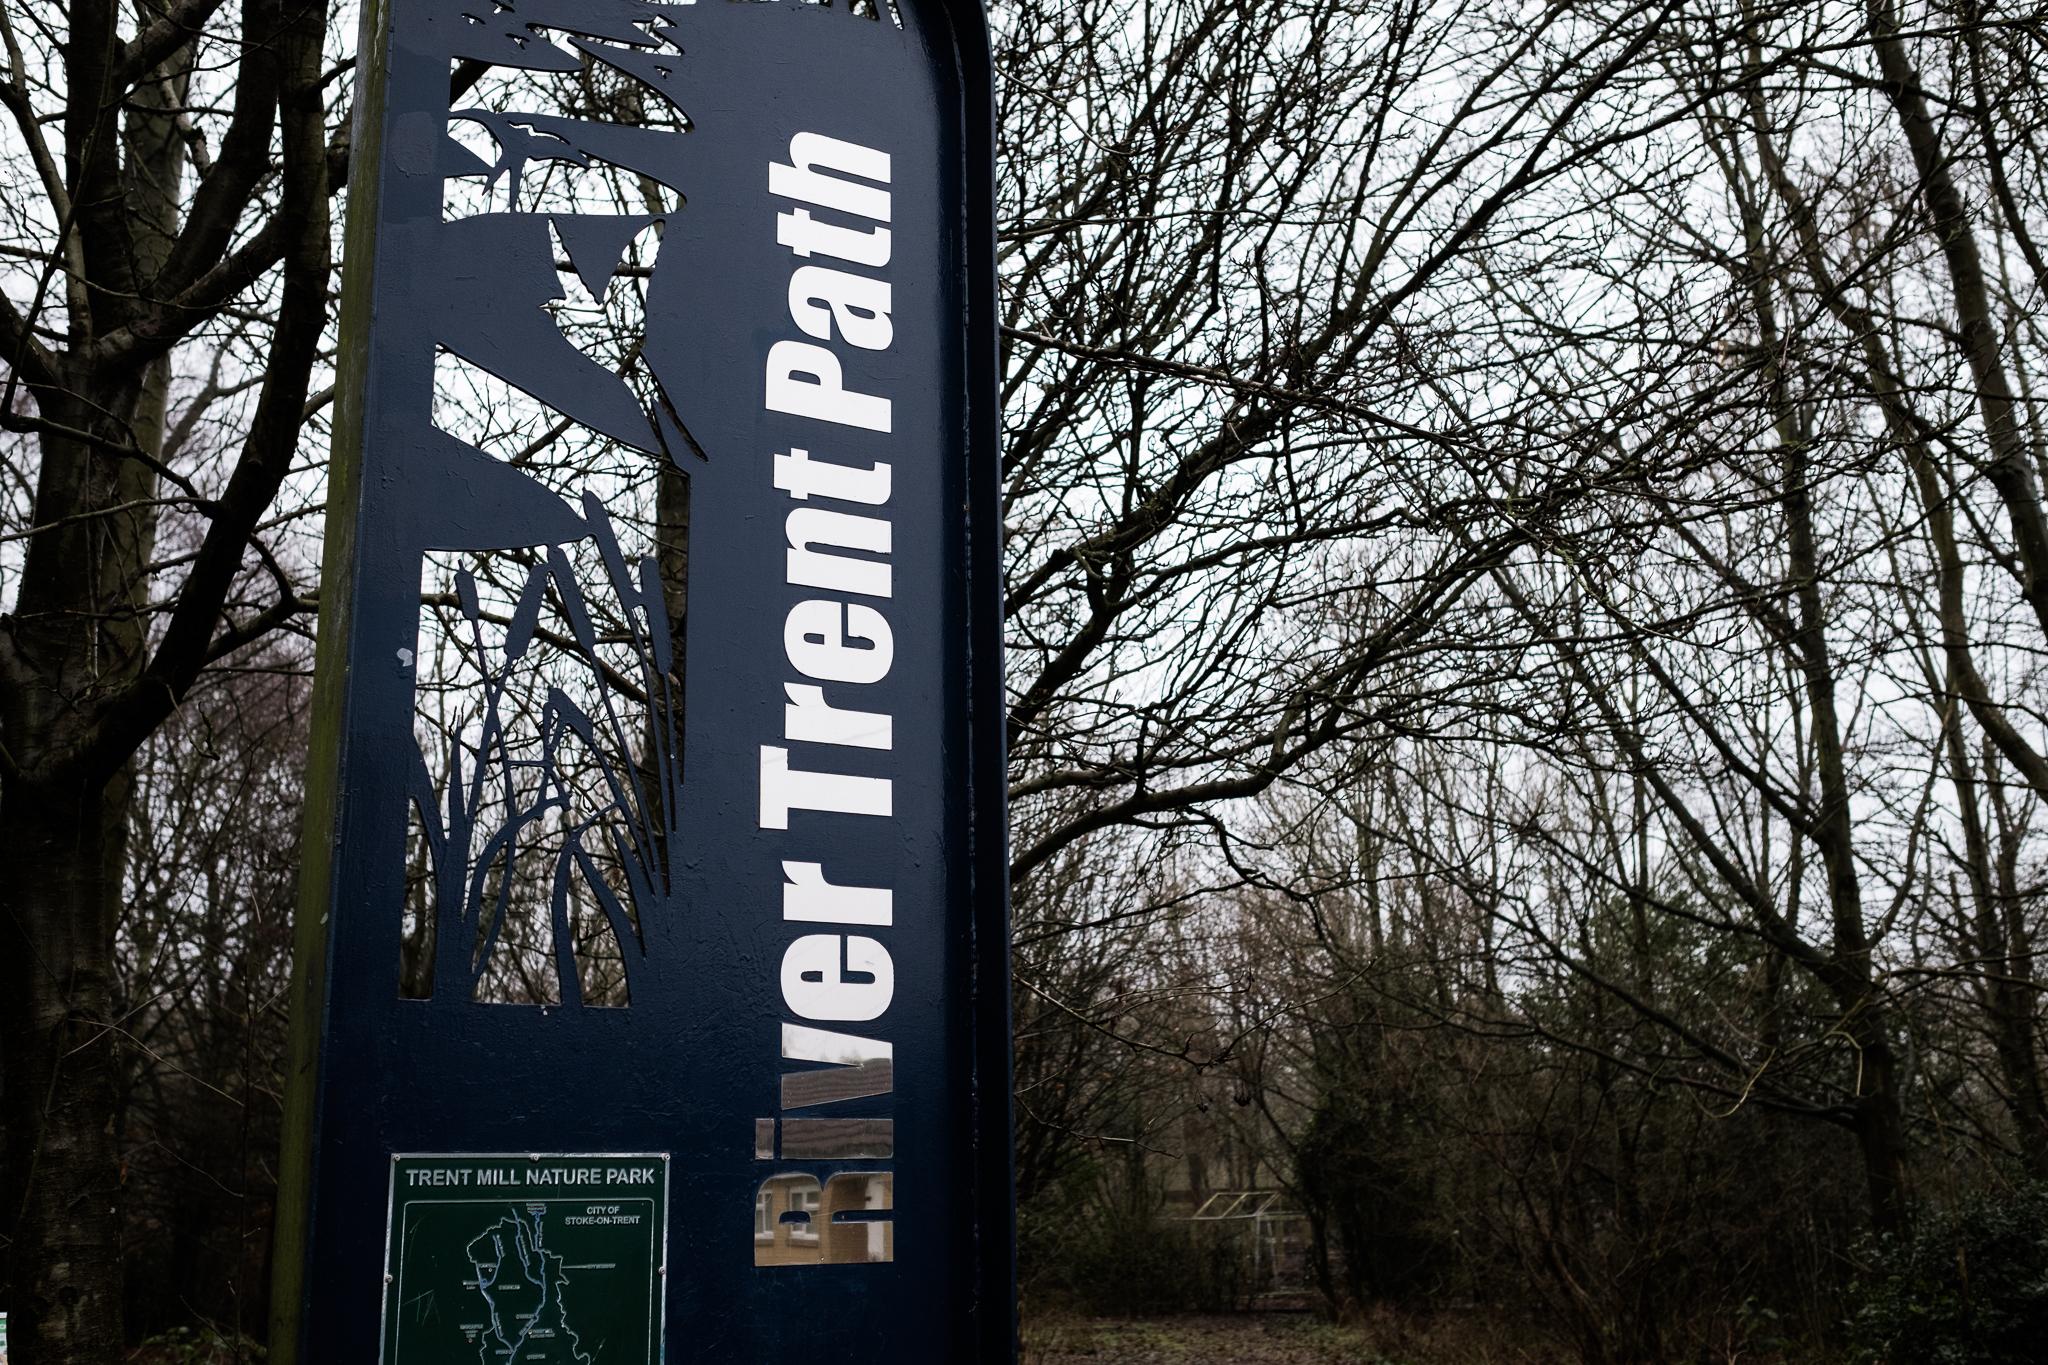 Closer to Home Walk Photowalk Joiner's Square, Hanley, Stoke-on-Trent, Staffordshire Winter Nature Reserve-23.jpg